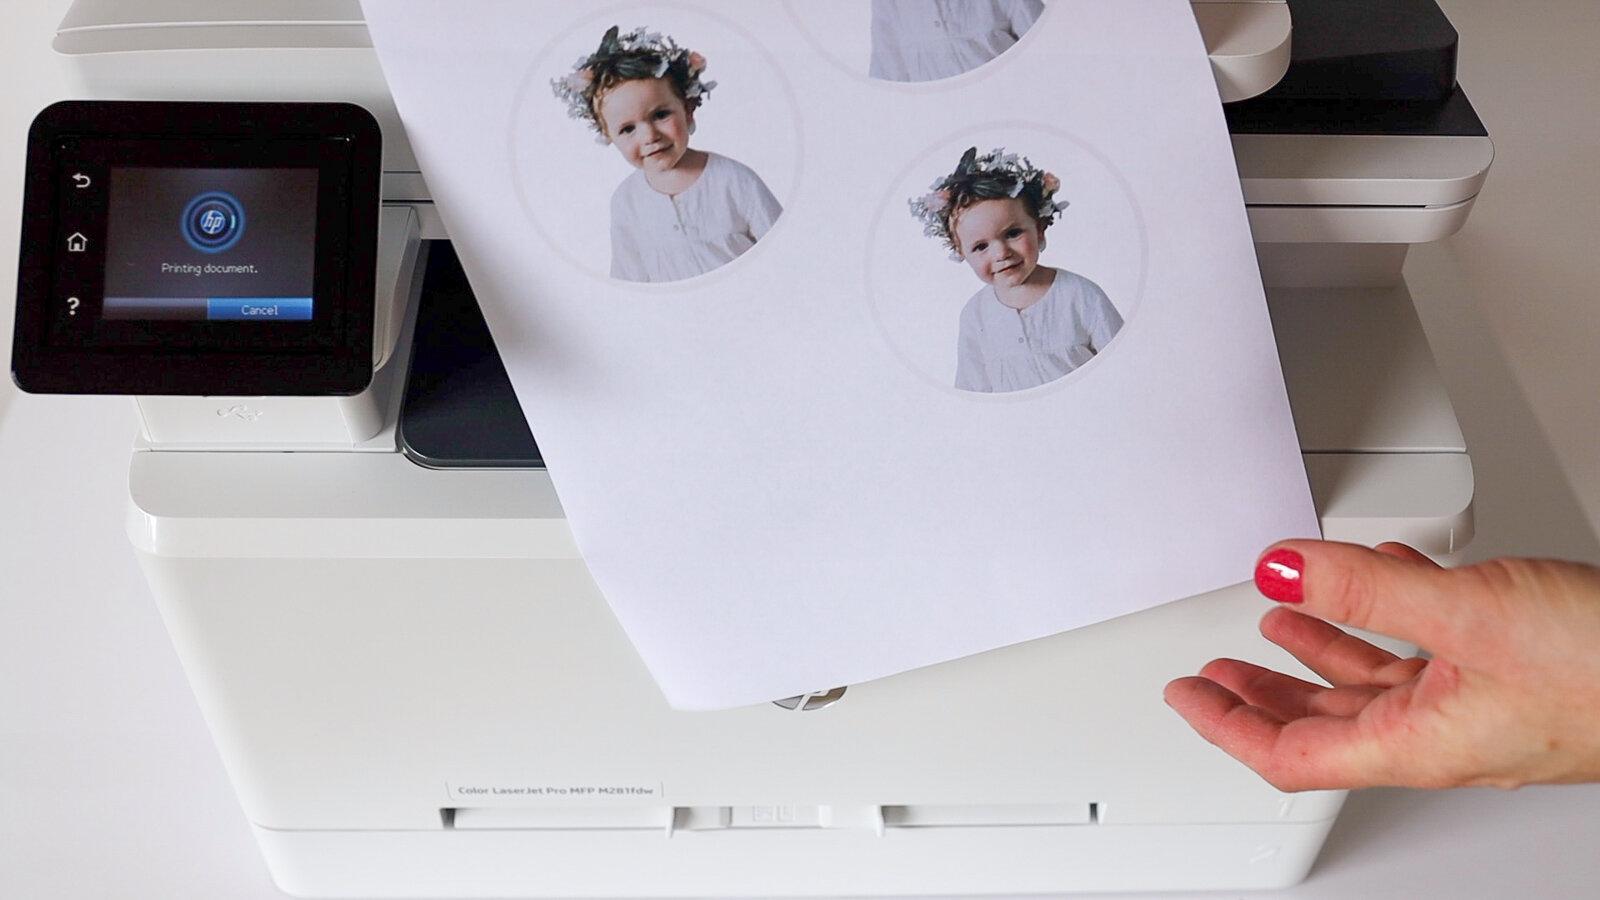 Mod_Podge_Photo_Transfers_by_Clever_Poppy_Printing-2.jpg